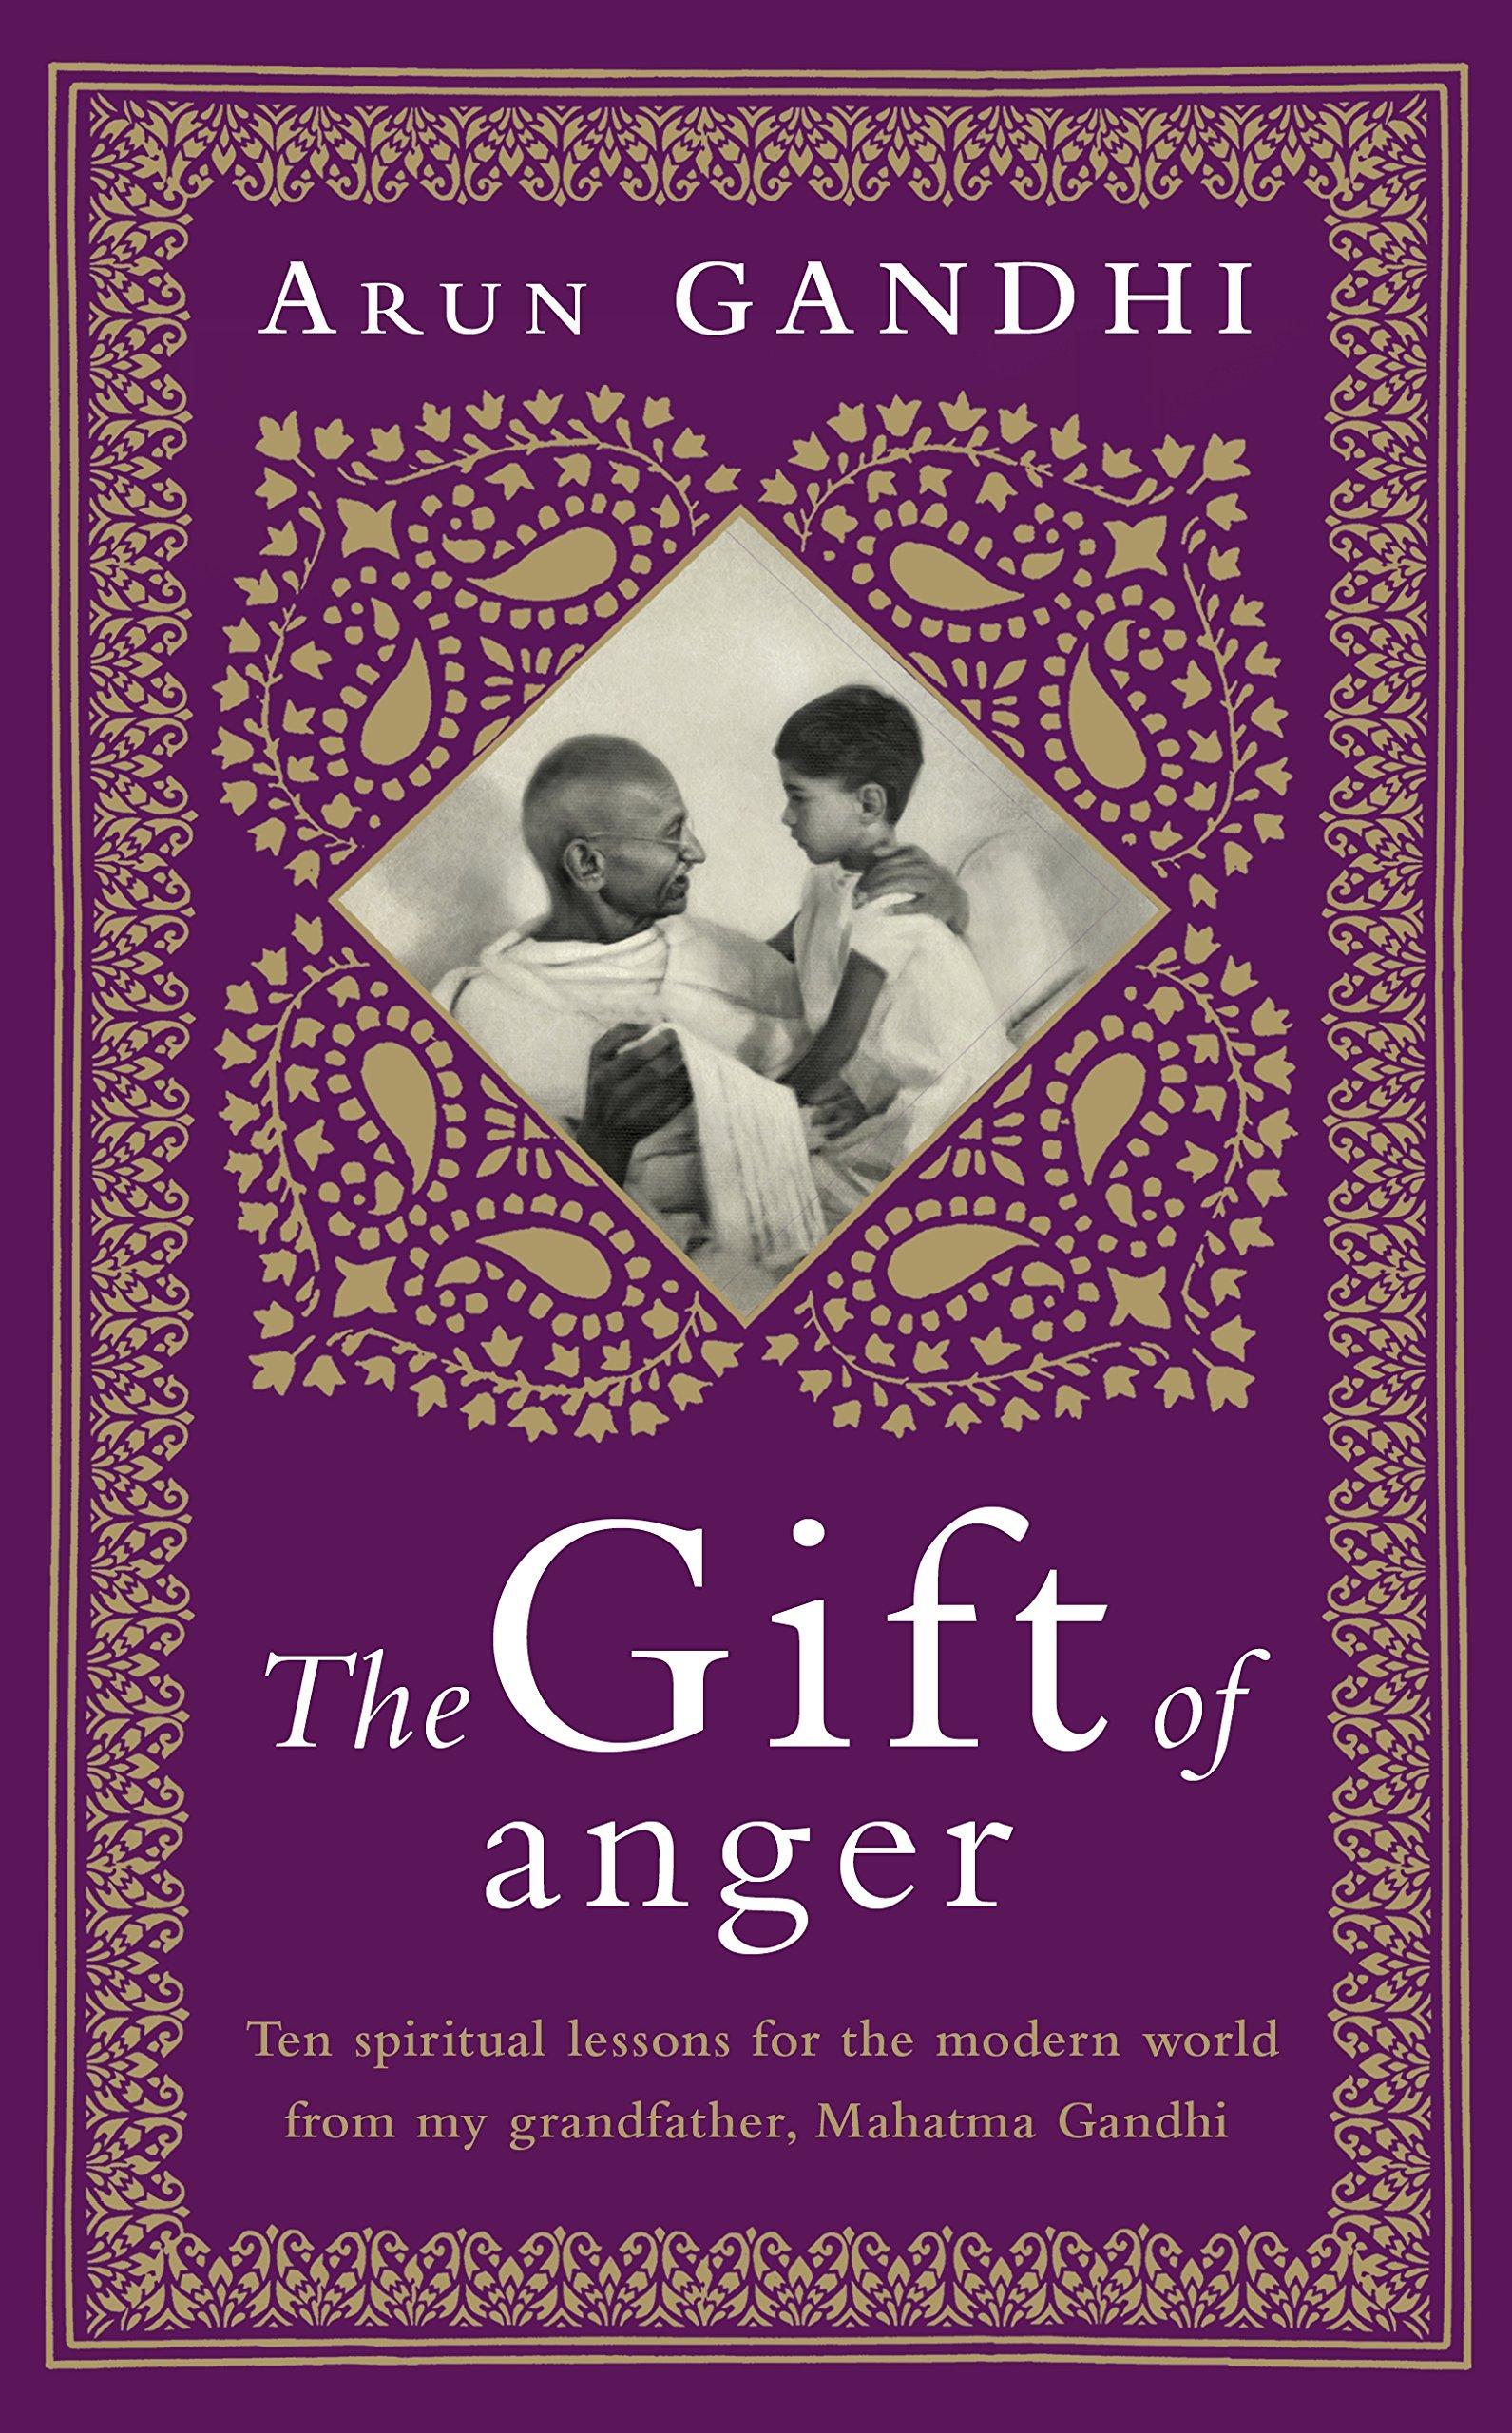 amazon the gift of anger arun gandhi india